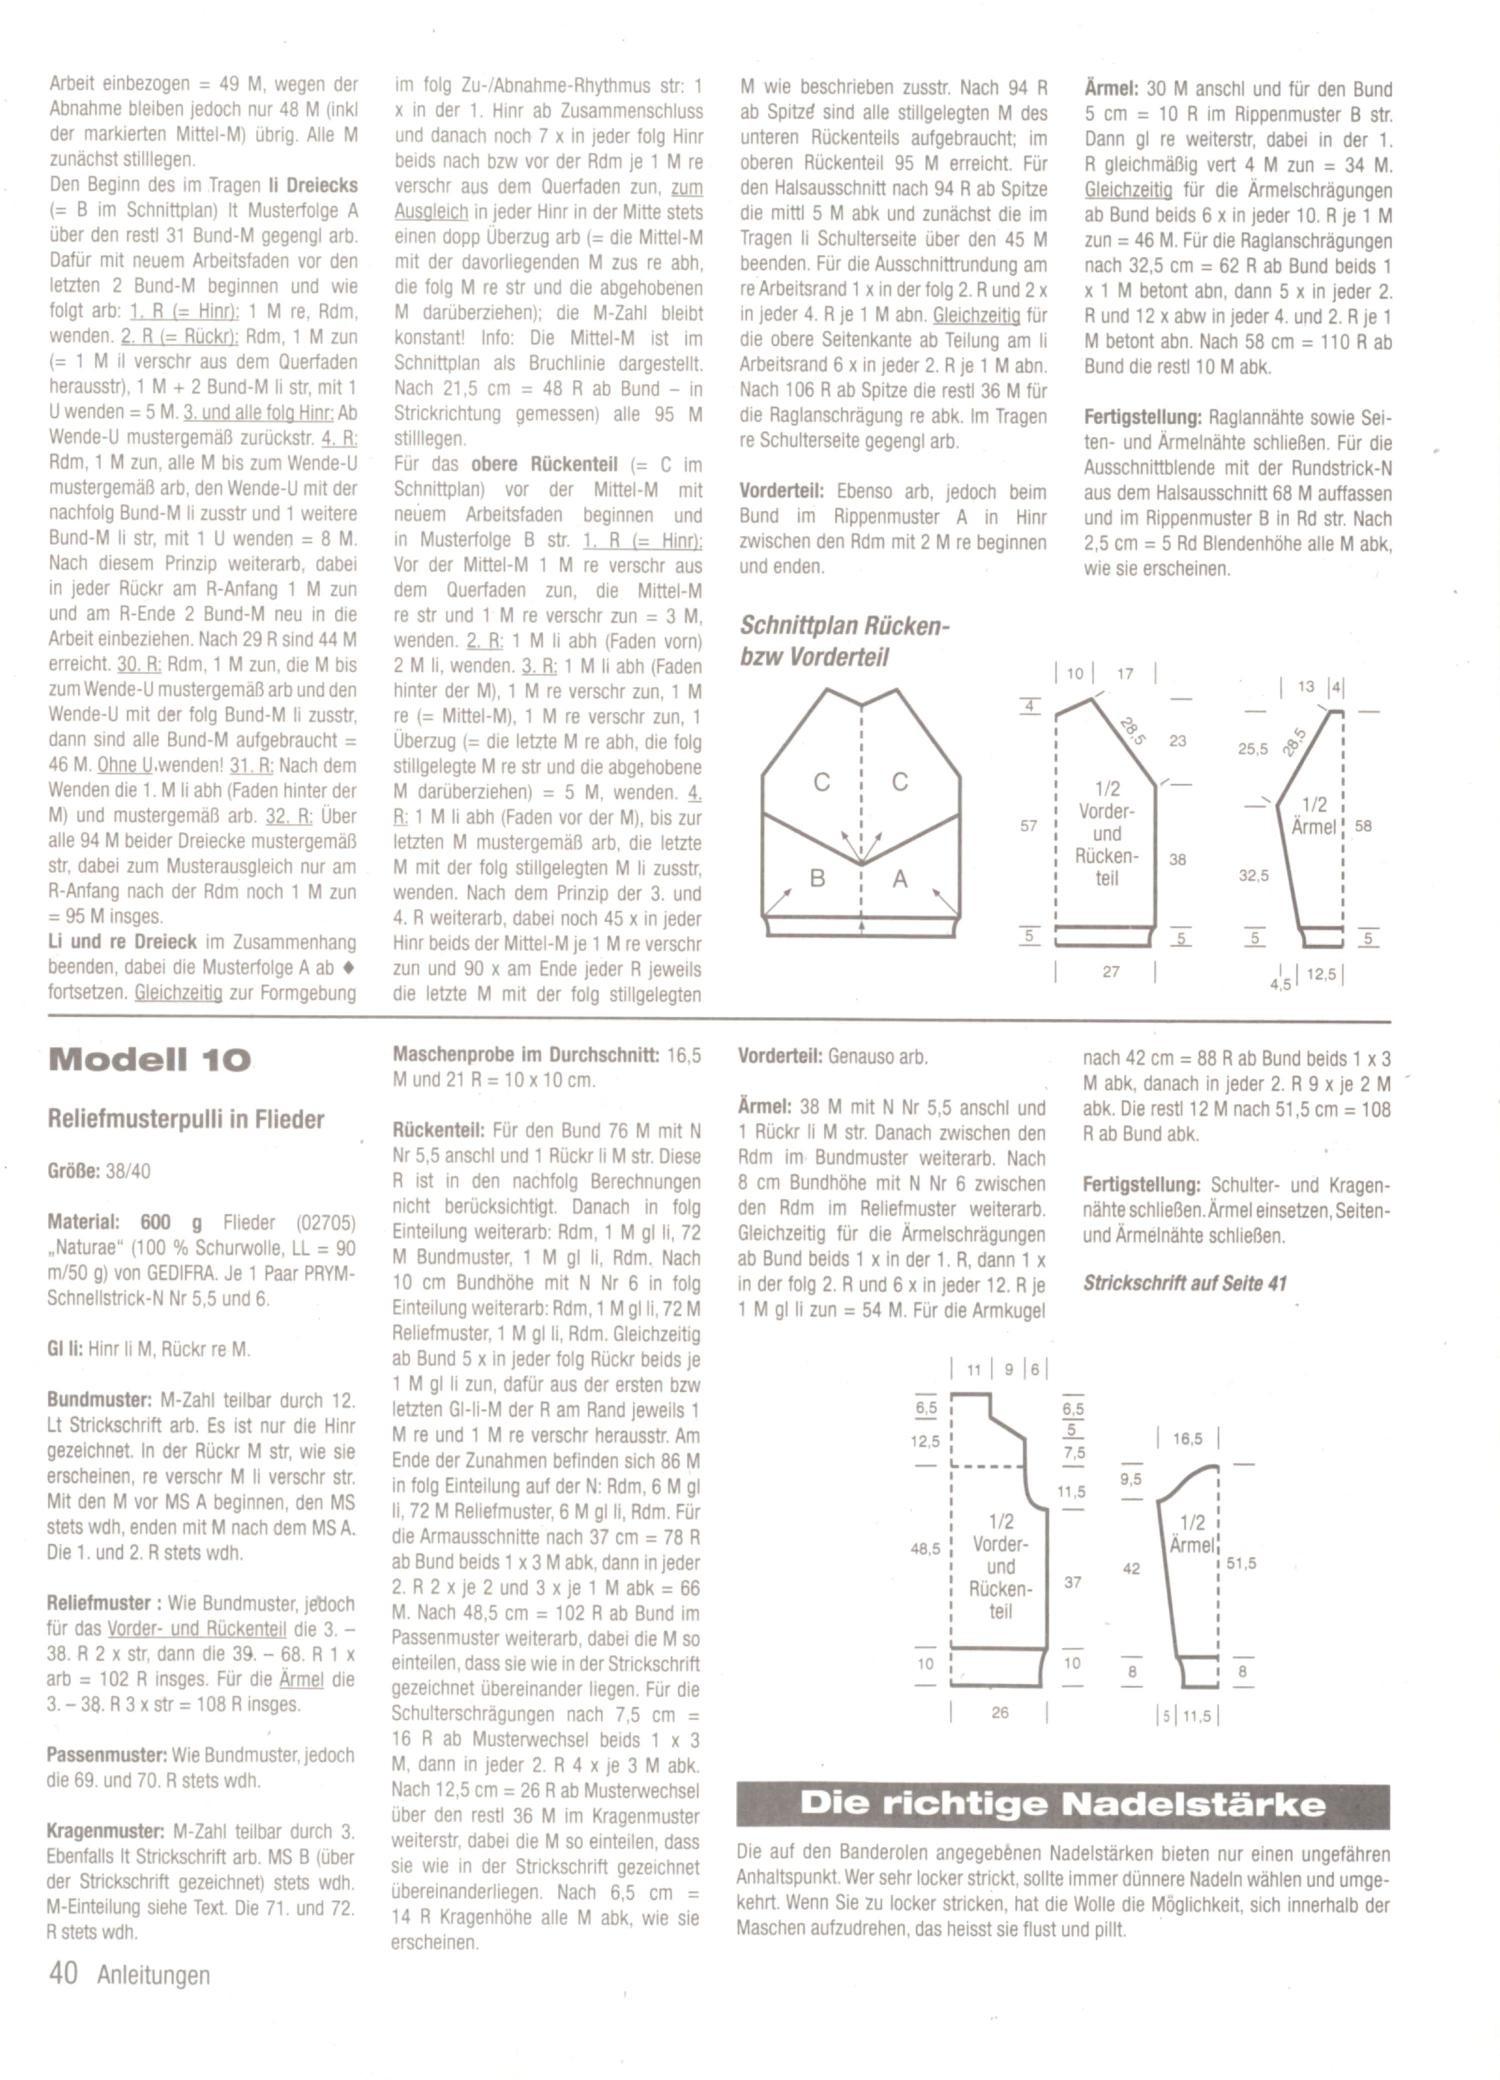 Page_00040.jpg